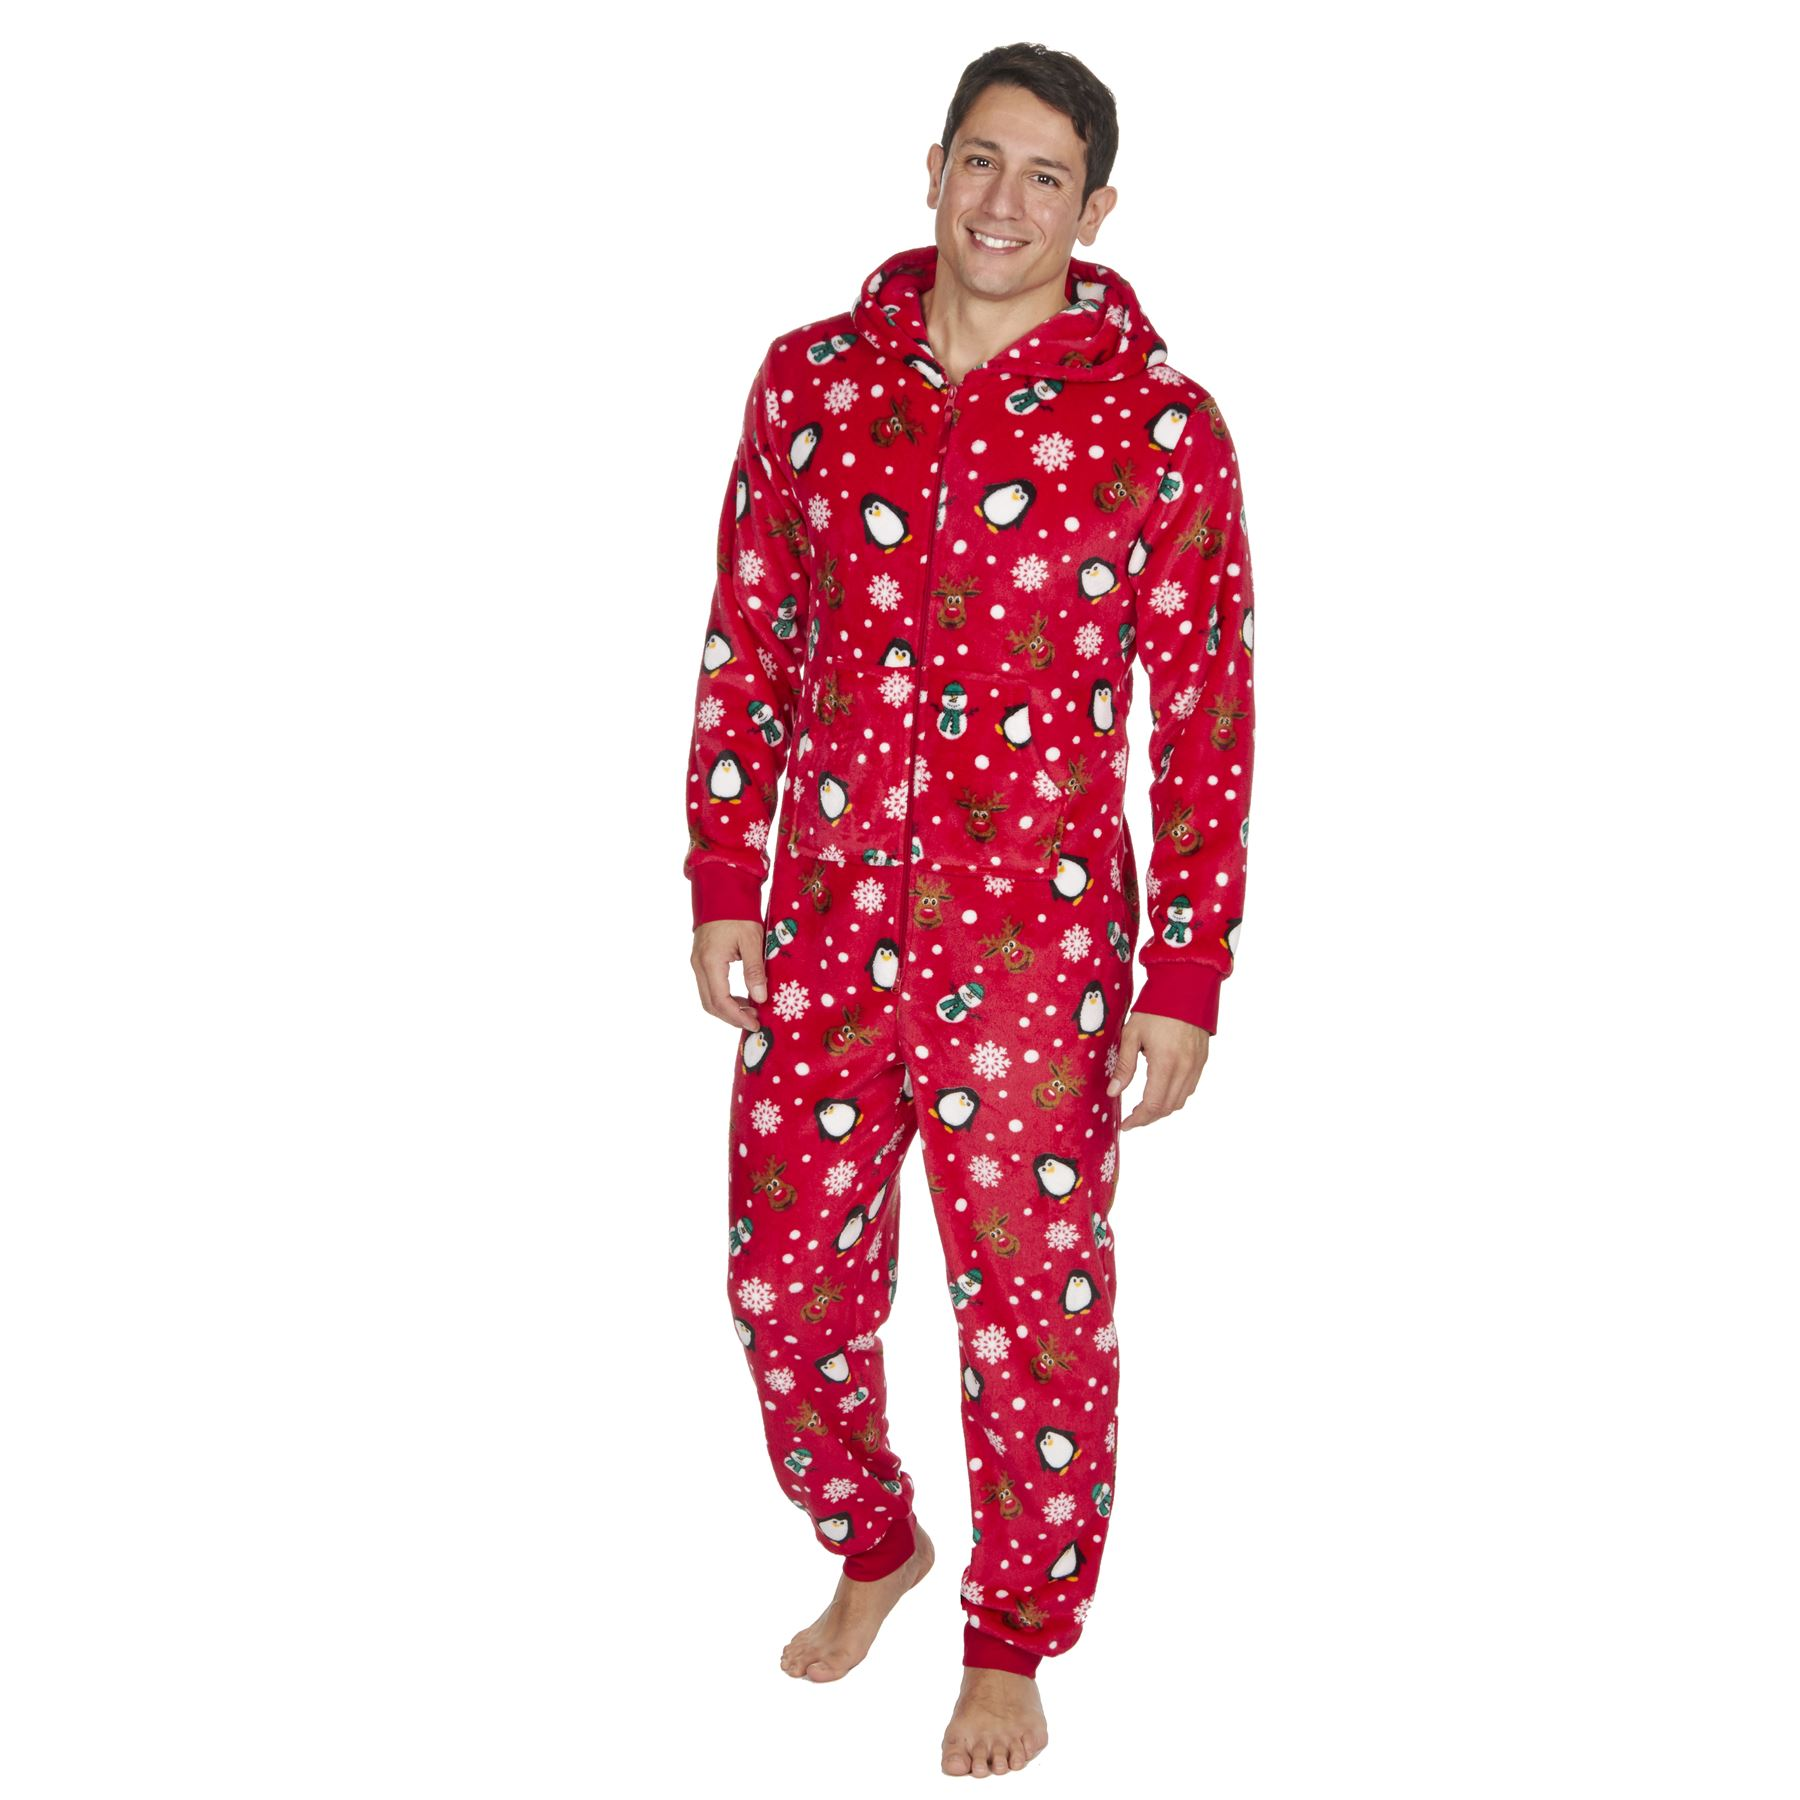 51869439ee 1Onesie Women's Mens Onezee Xmas Soft Snuggle Fleece All in One ...